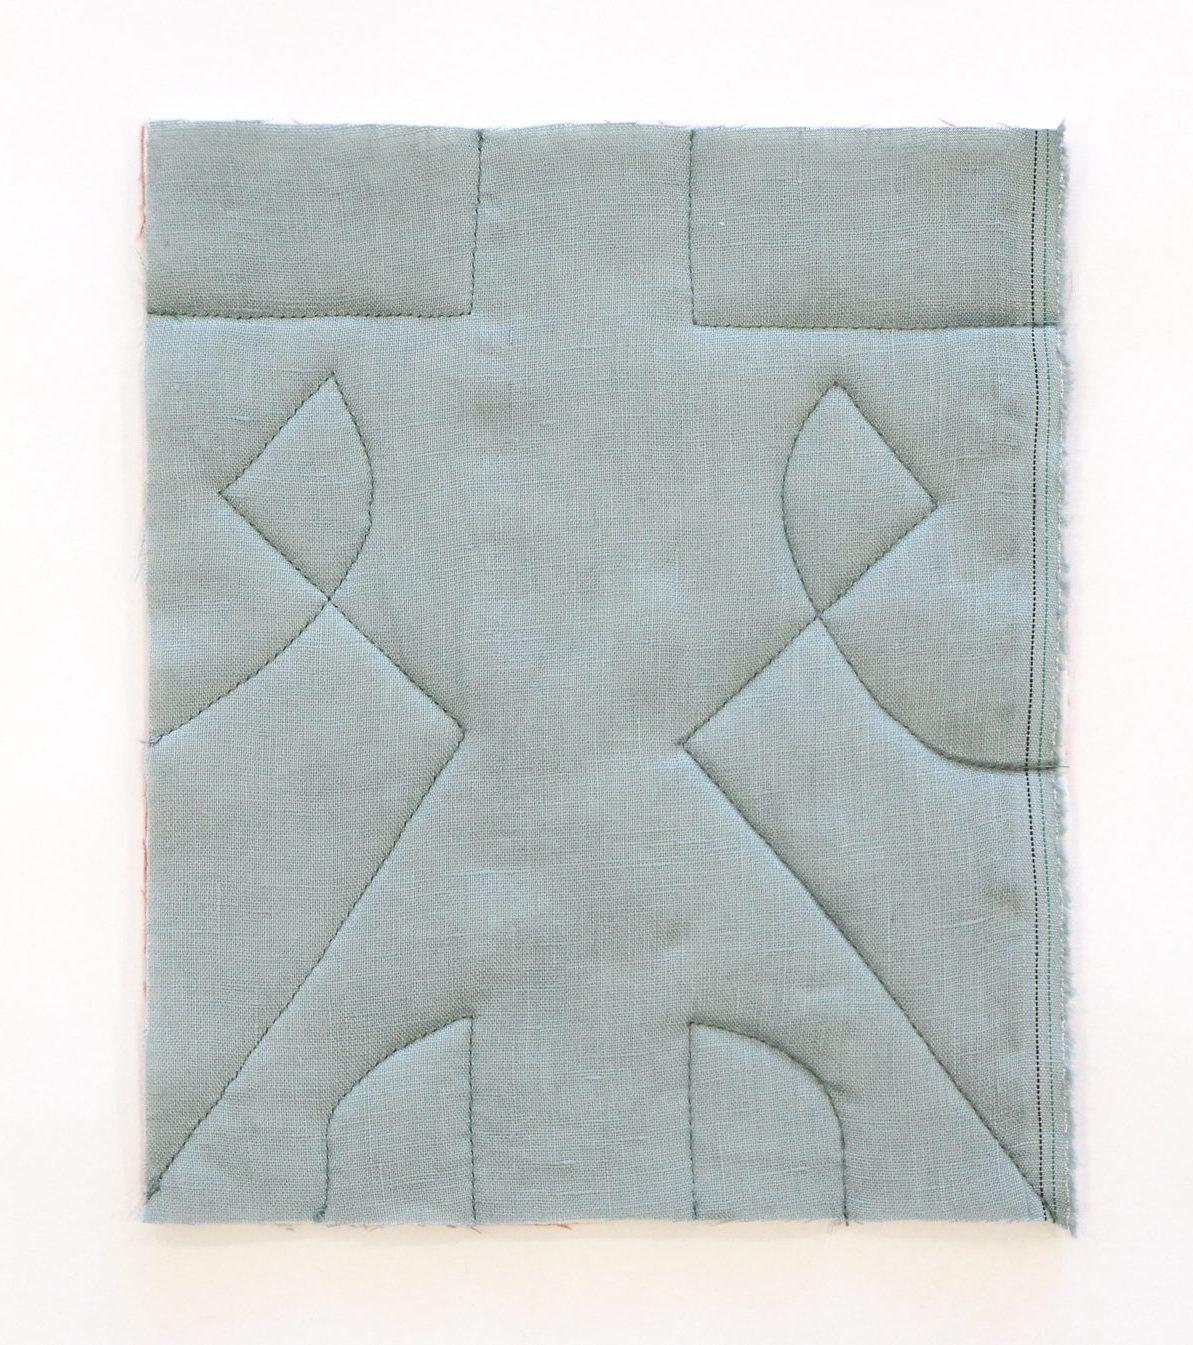 Megan Nielsen Patterns | Hovea Sewalong: Quilting Design | Geometric & Curved Quilting Designs